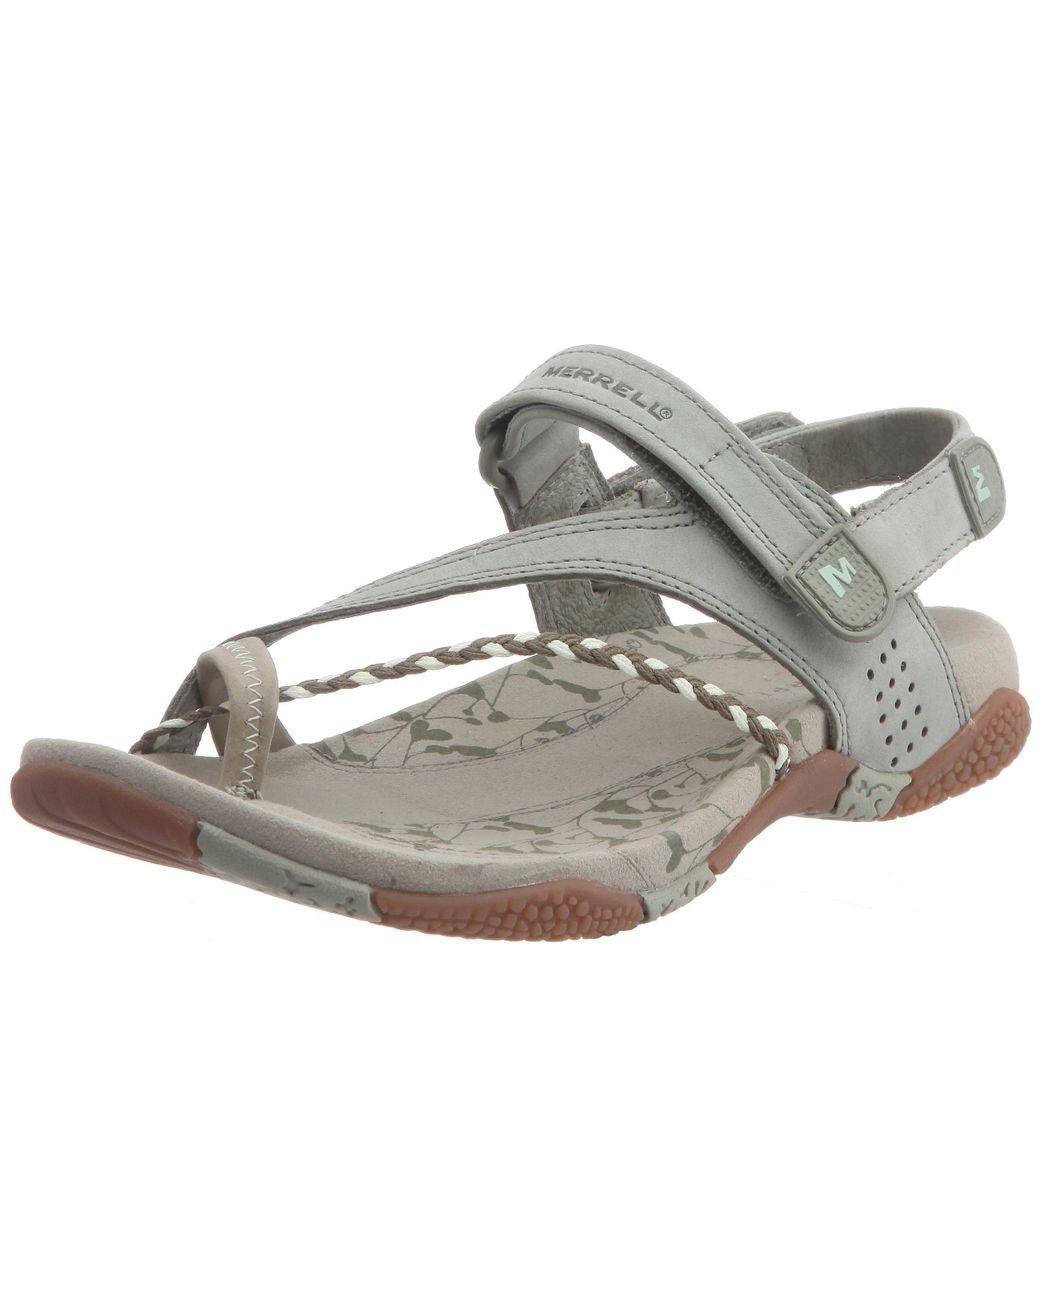 merrell siena sandals size 8 nike